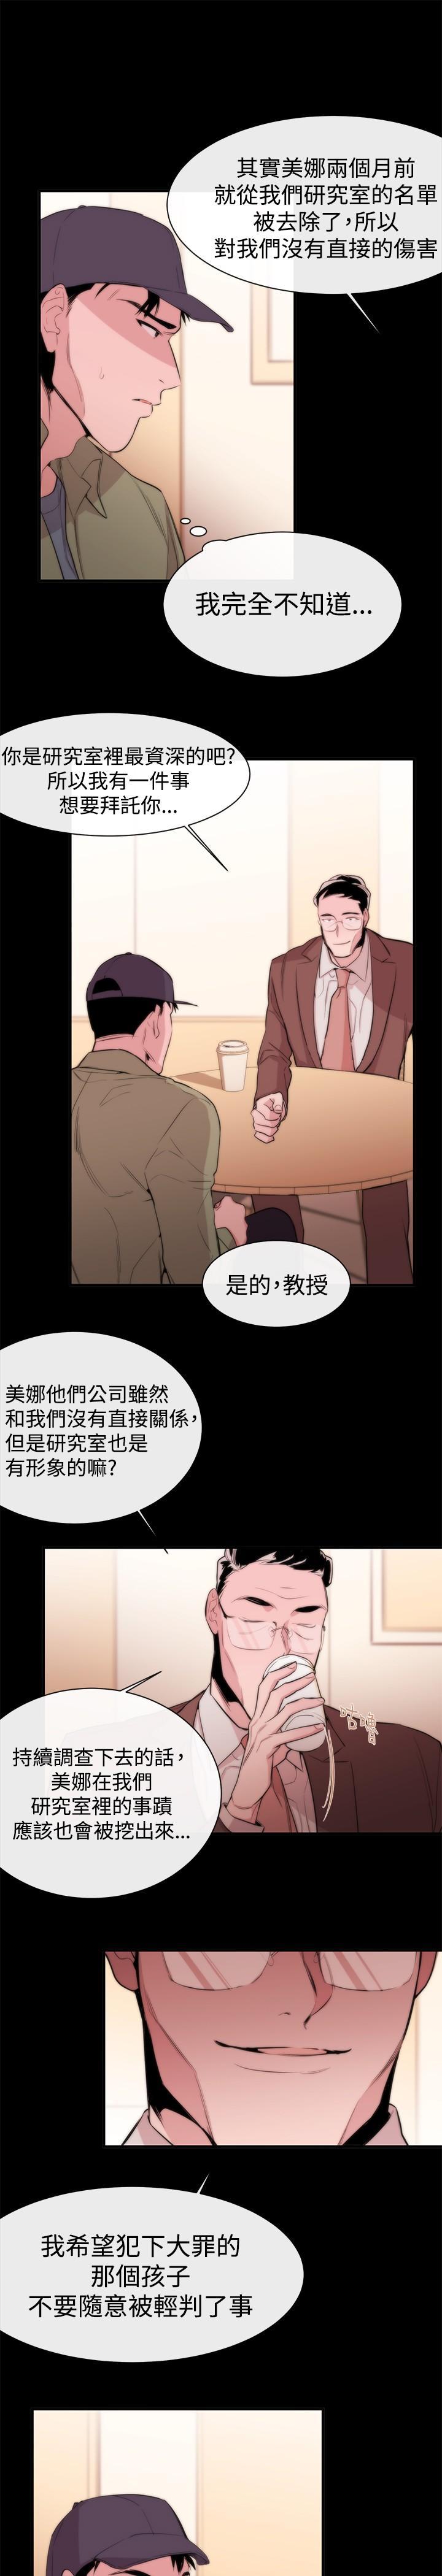 Female Disciple 女助教 Ch.1~8 [Chinese]中文 240